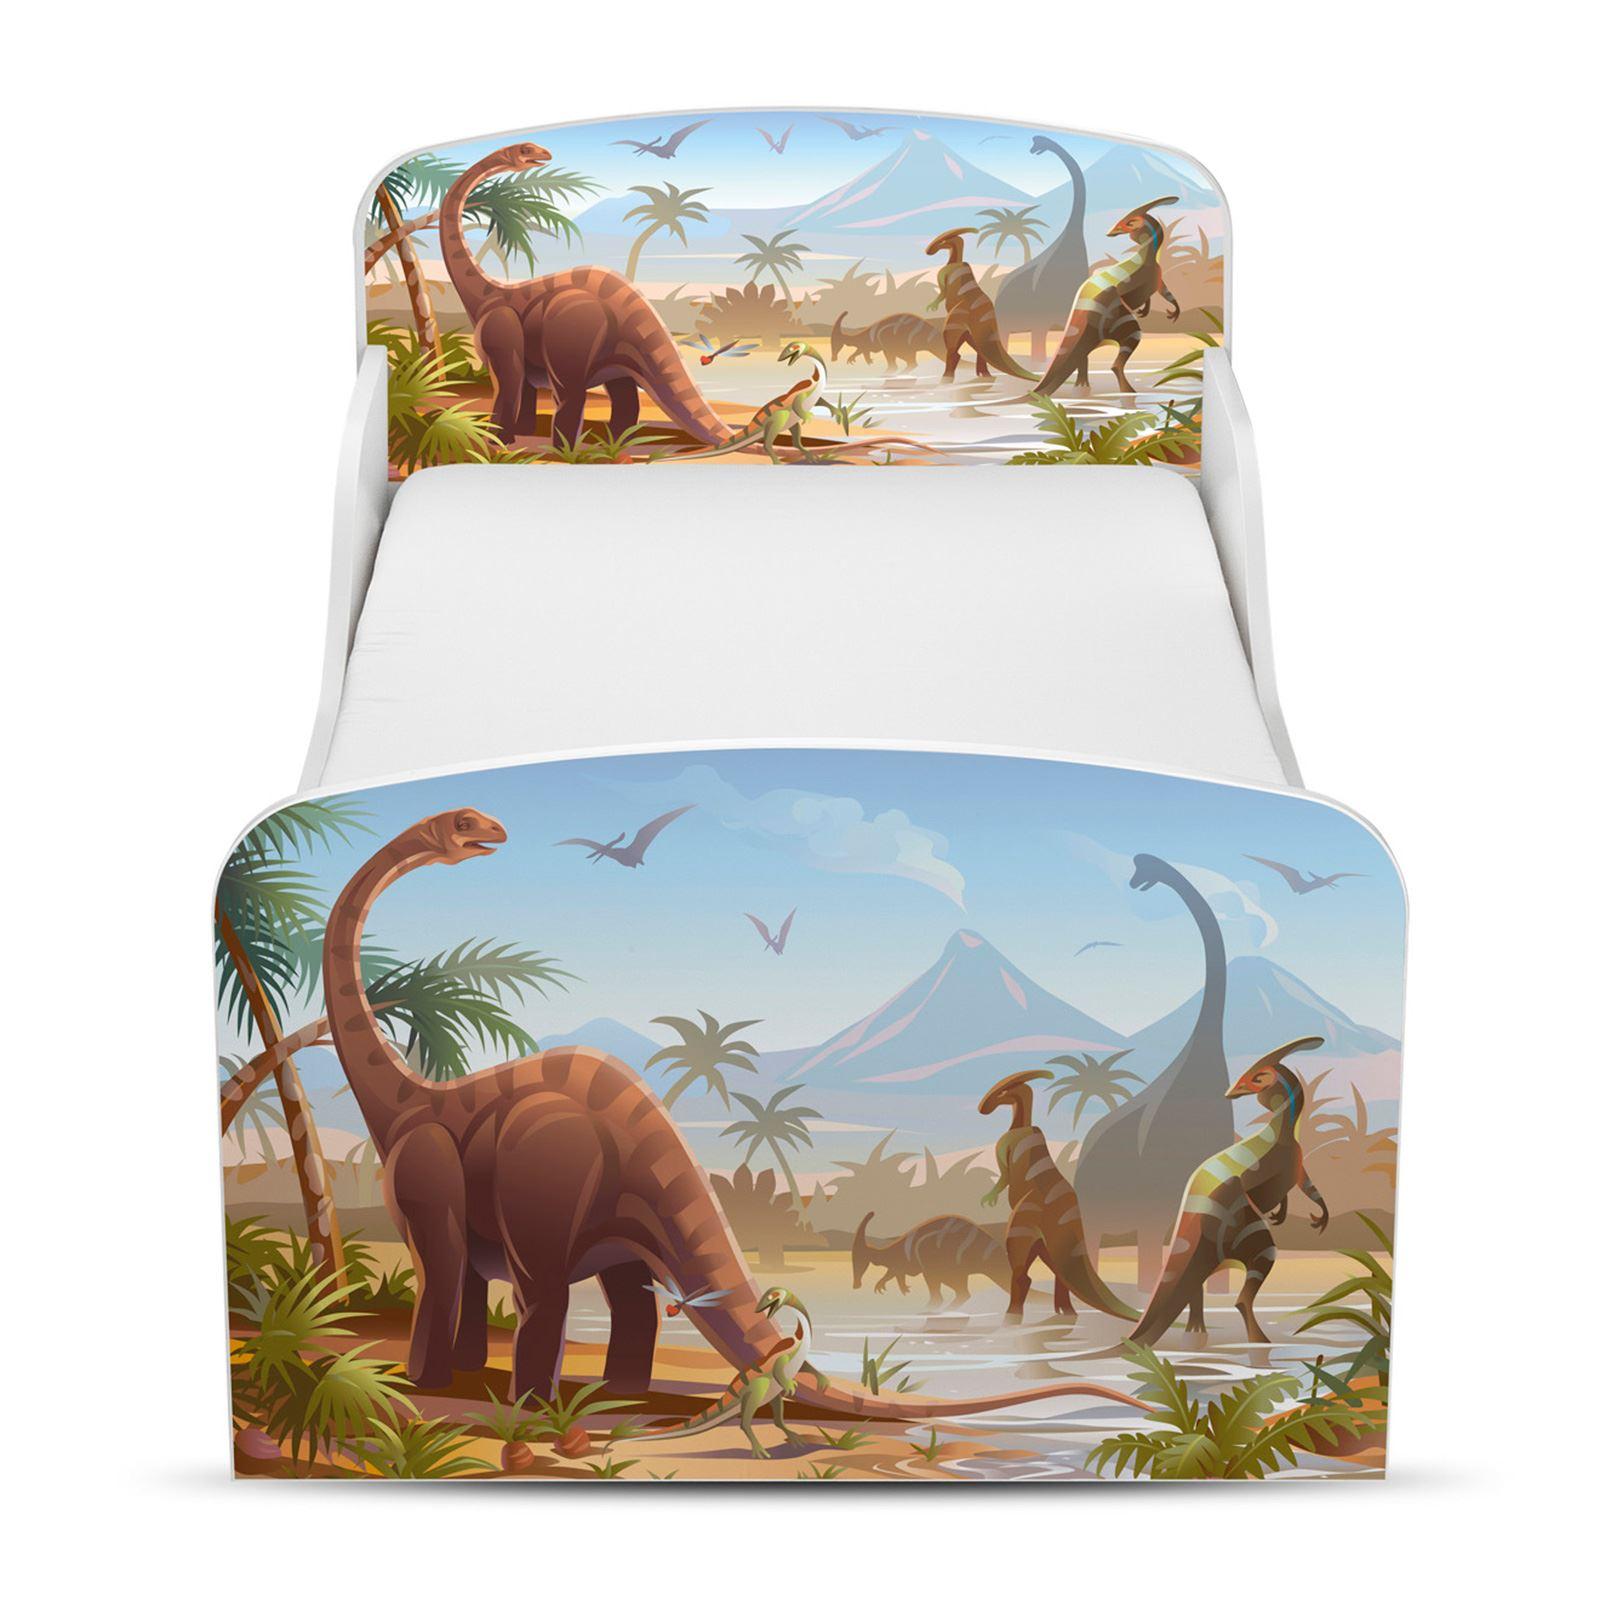 Price-Right-Home-Jurasico-Dinosaurios-Cama-Infantil-Colchon-Opciones-Nuevo miniatura 15